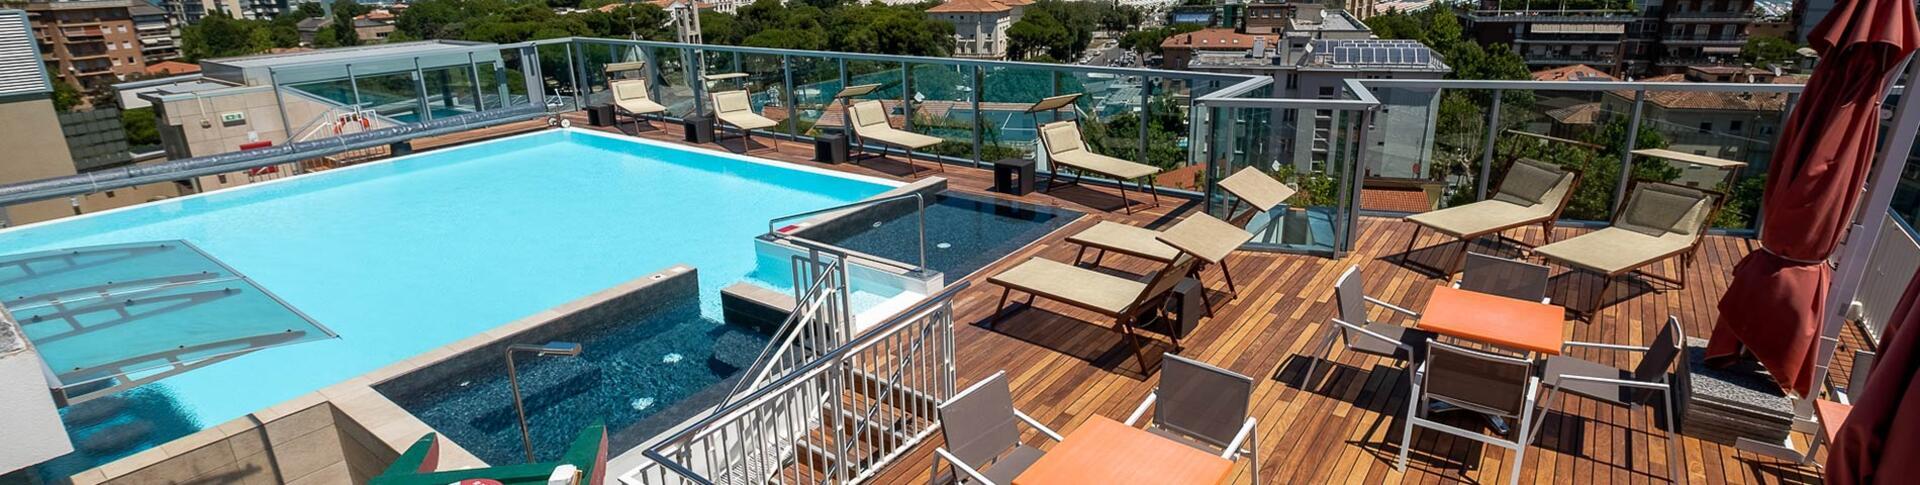 ariahotel fr hotel-avec-piscine 013